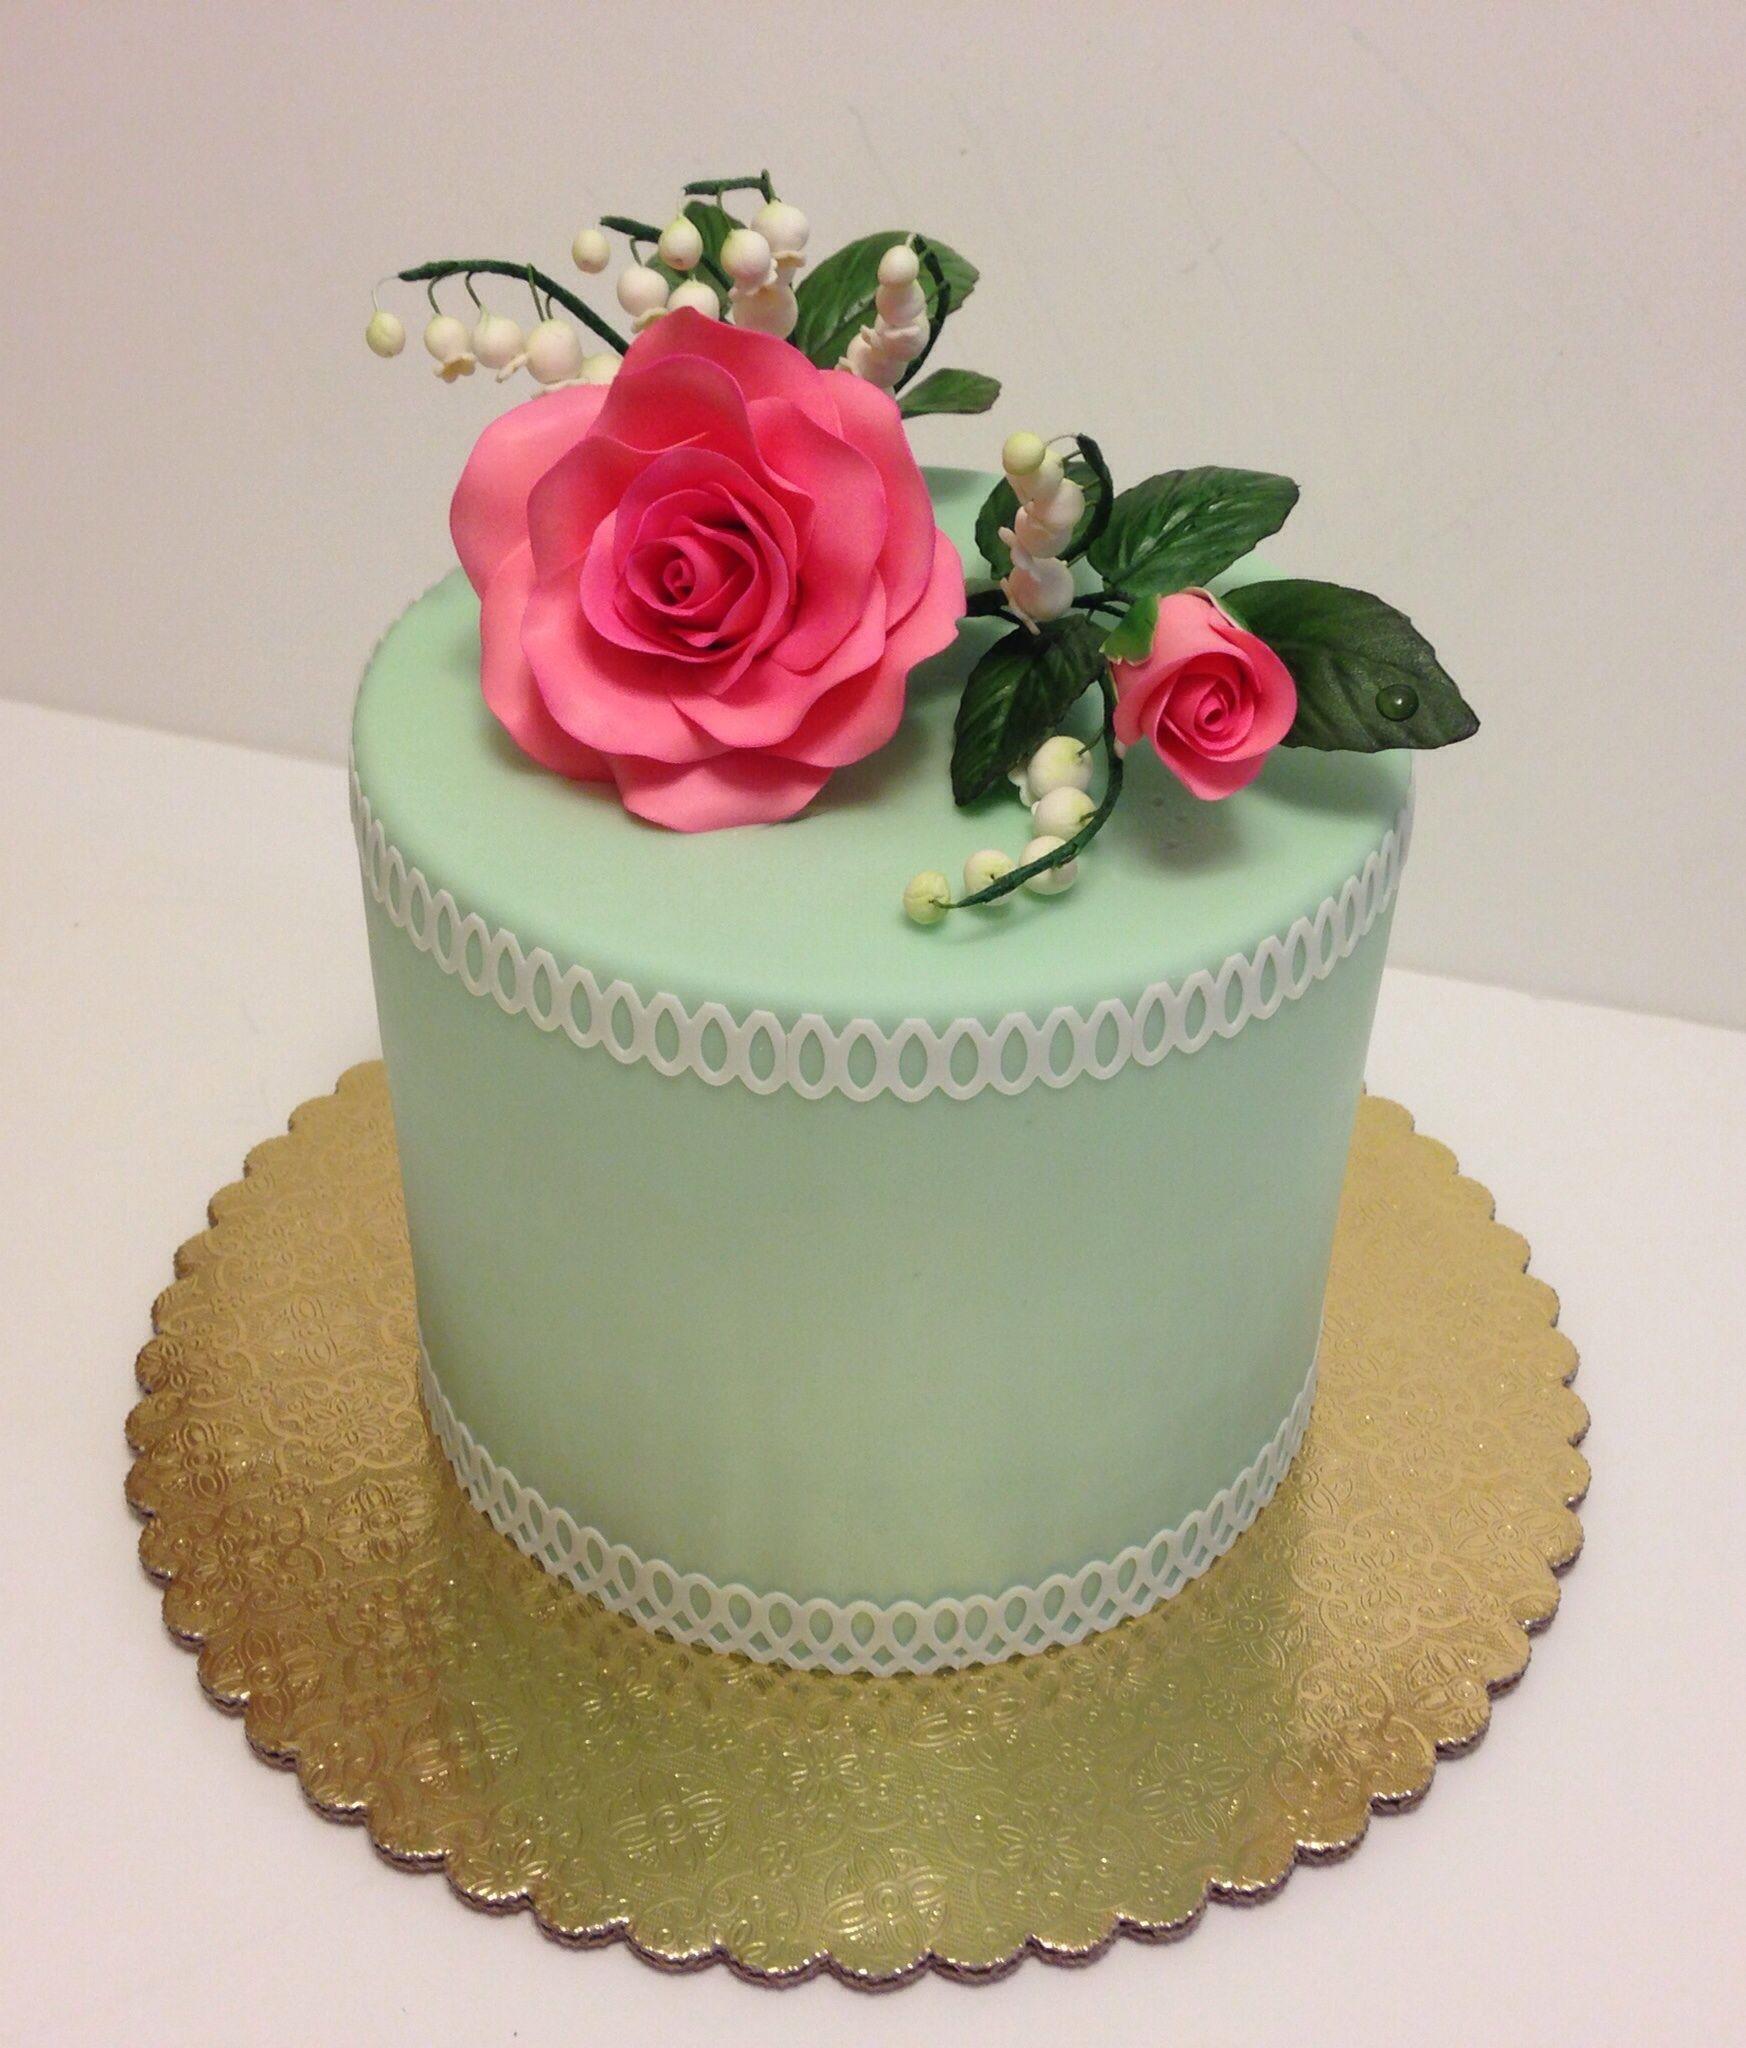 Birthday Cakes Vanilla Cake And Raspberry Whipped Cream Filling